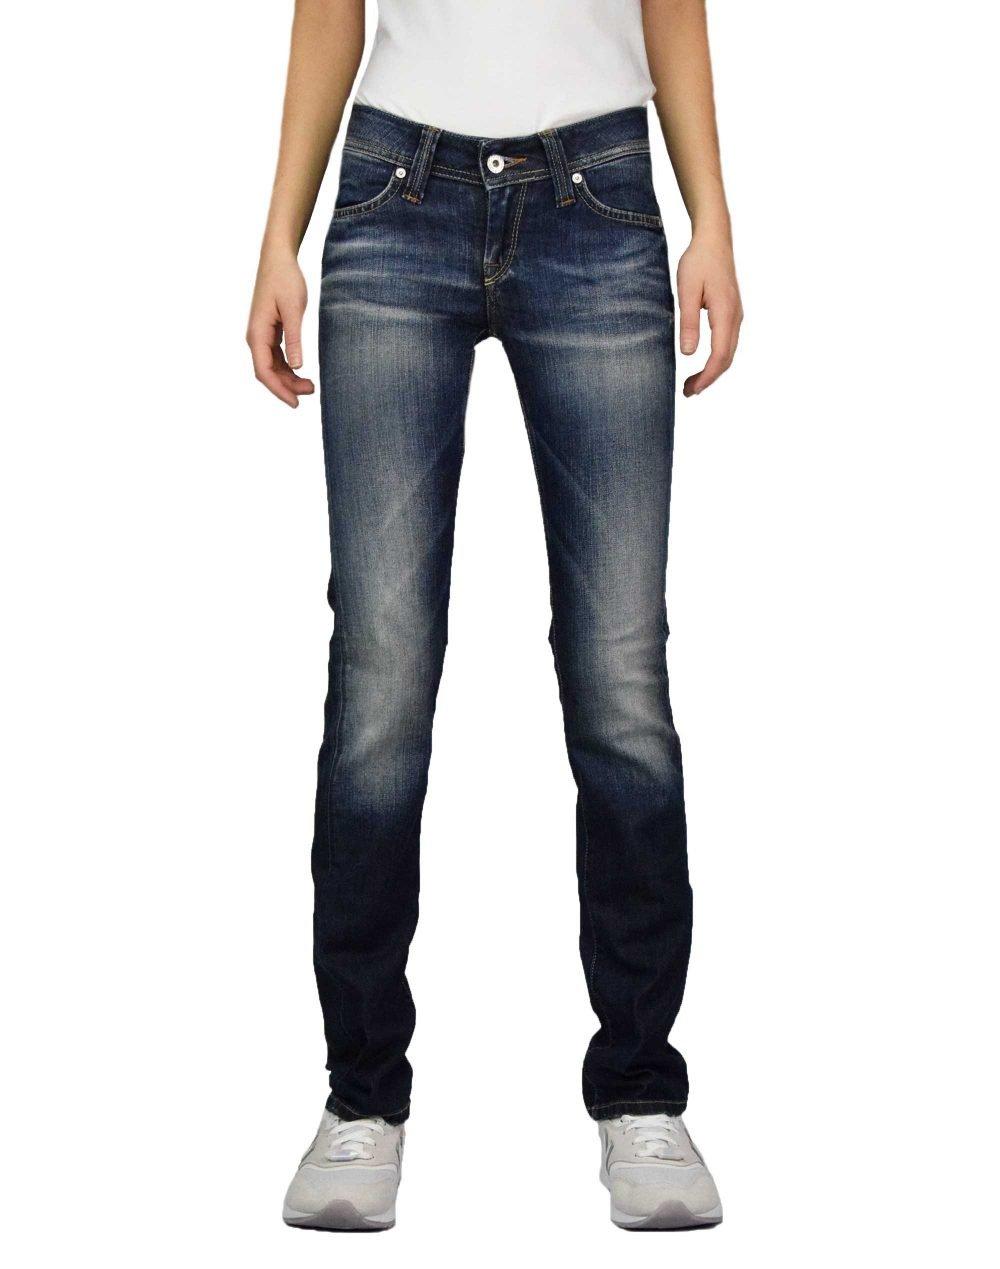 Pepe Jeans Diva (102PJBAOL) Blue Denim